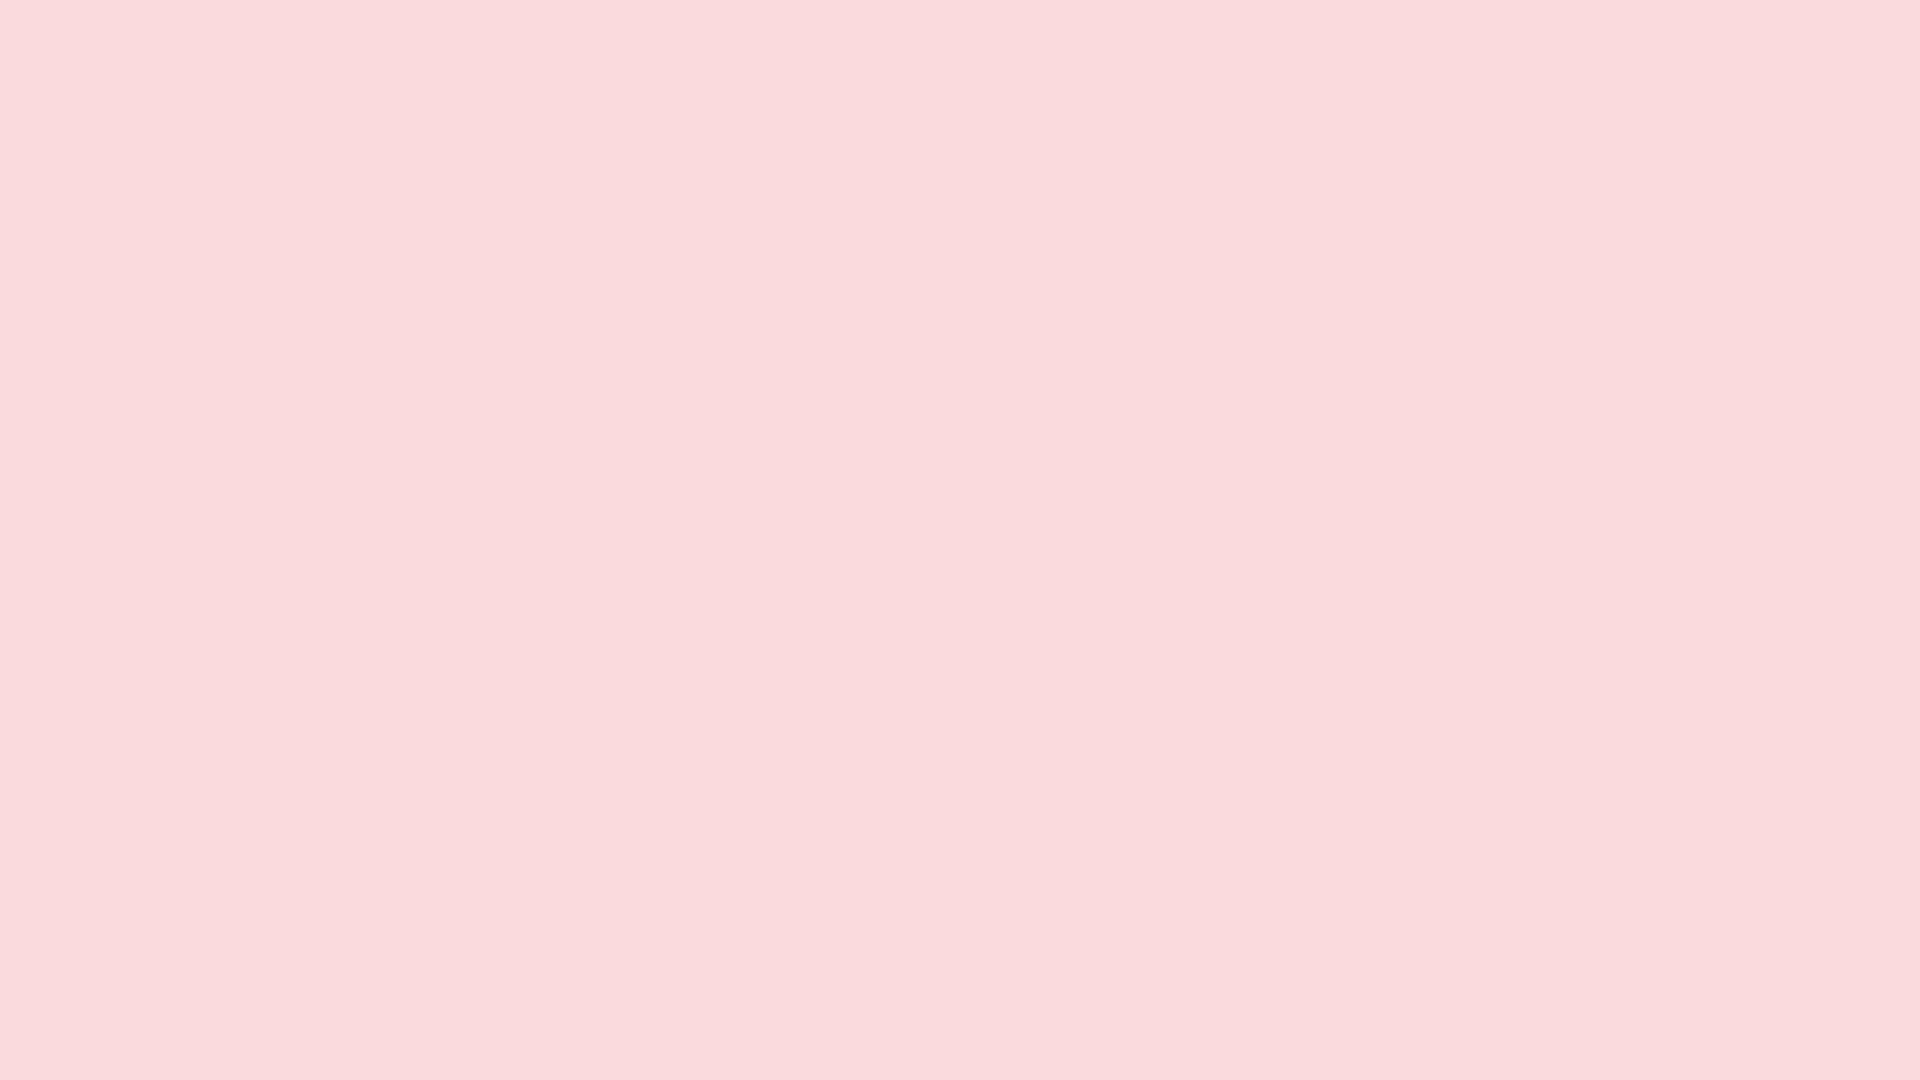 Super Pink Background